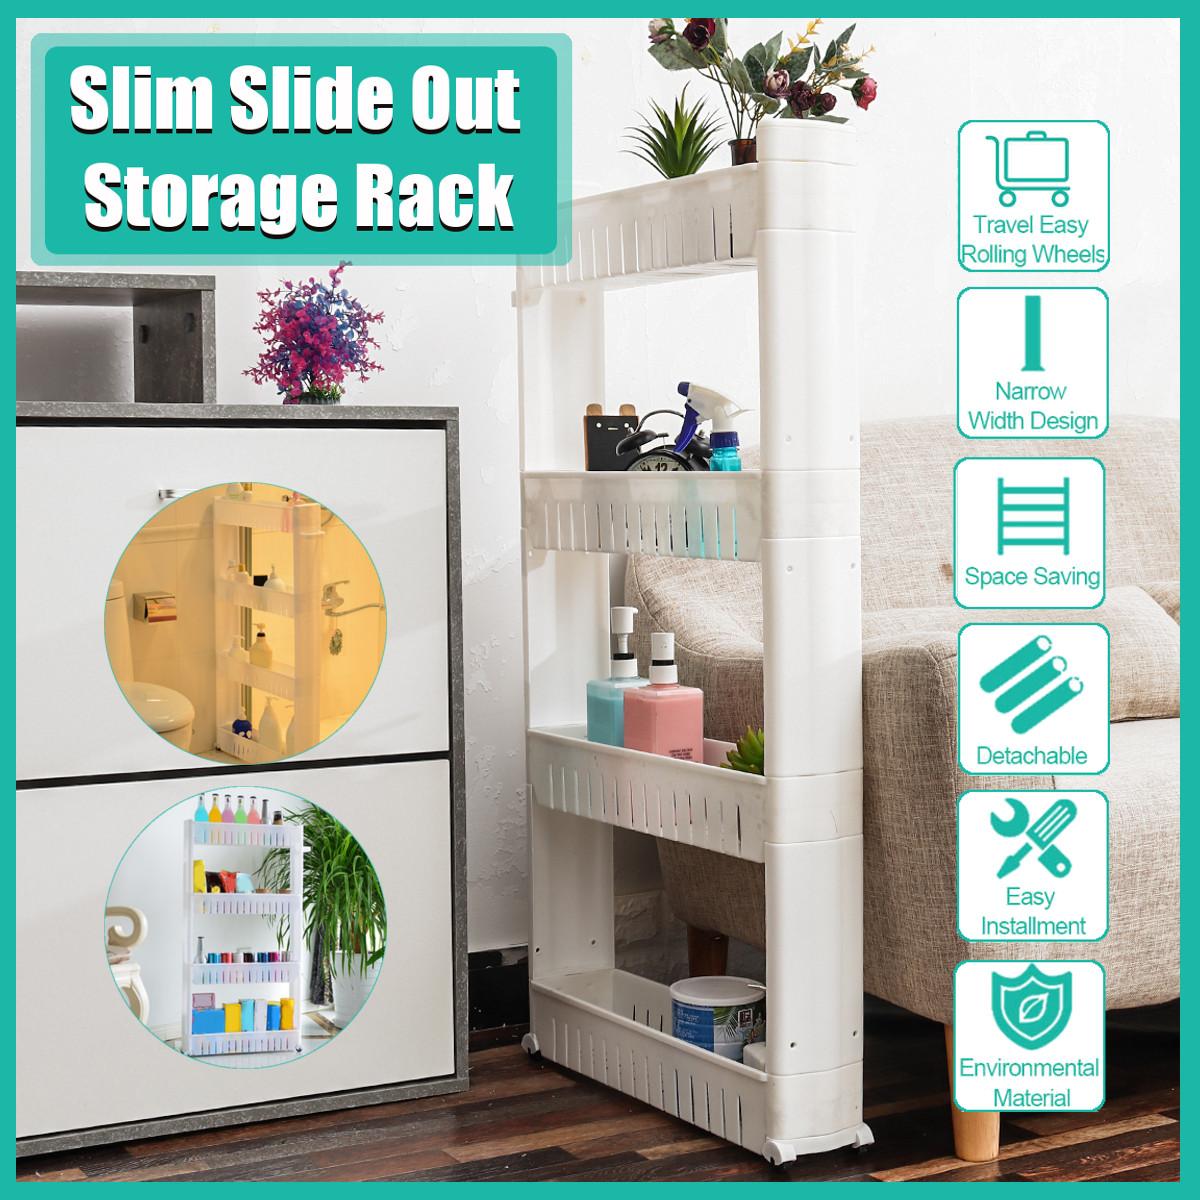 4 Tier Slim Slide Out Kitchen Bathroom Thin Trolley Cart Rack Holder Storage Shelf Organization White Buy Online At Best Prices In Bangladesh Daraz Com Bd